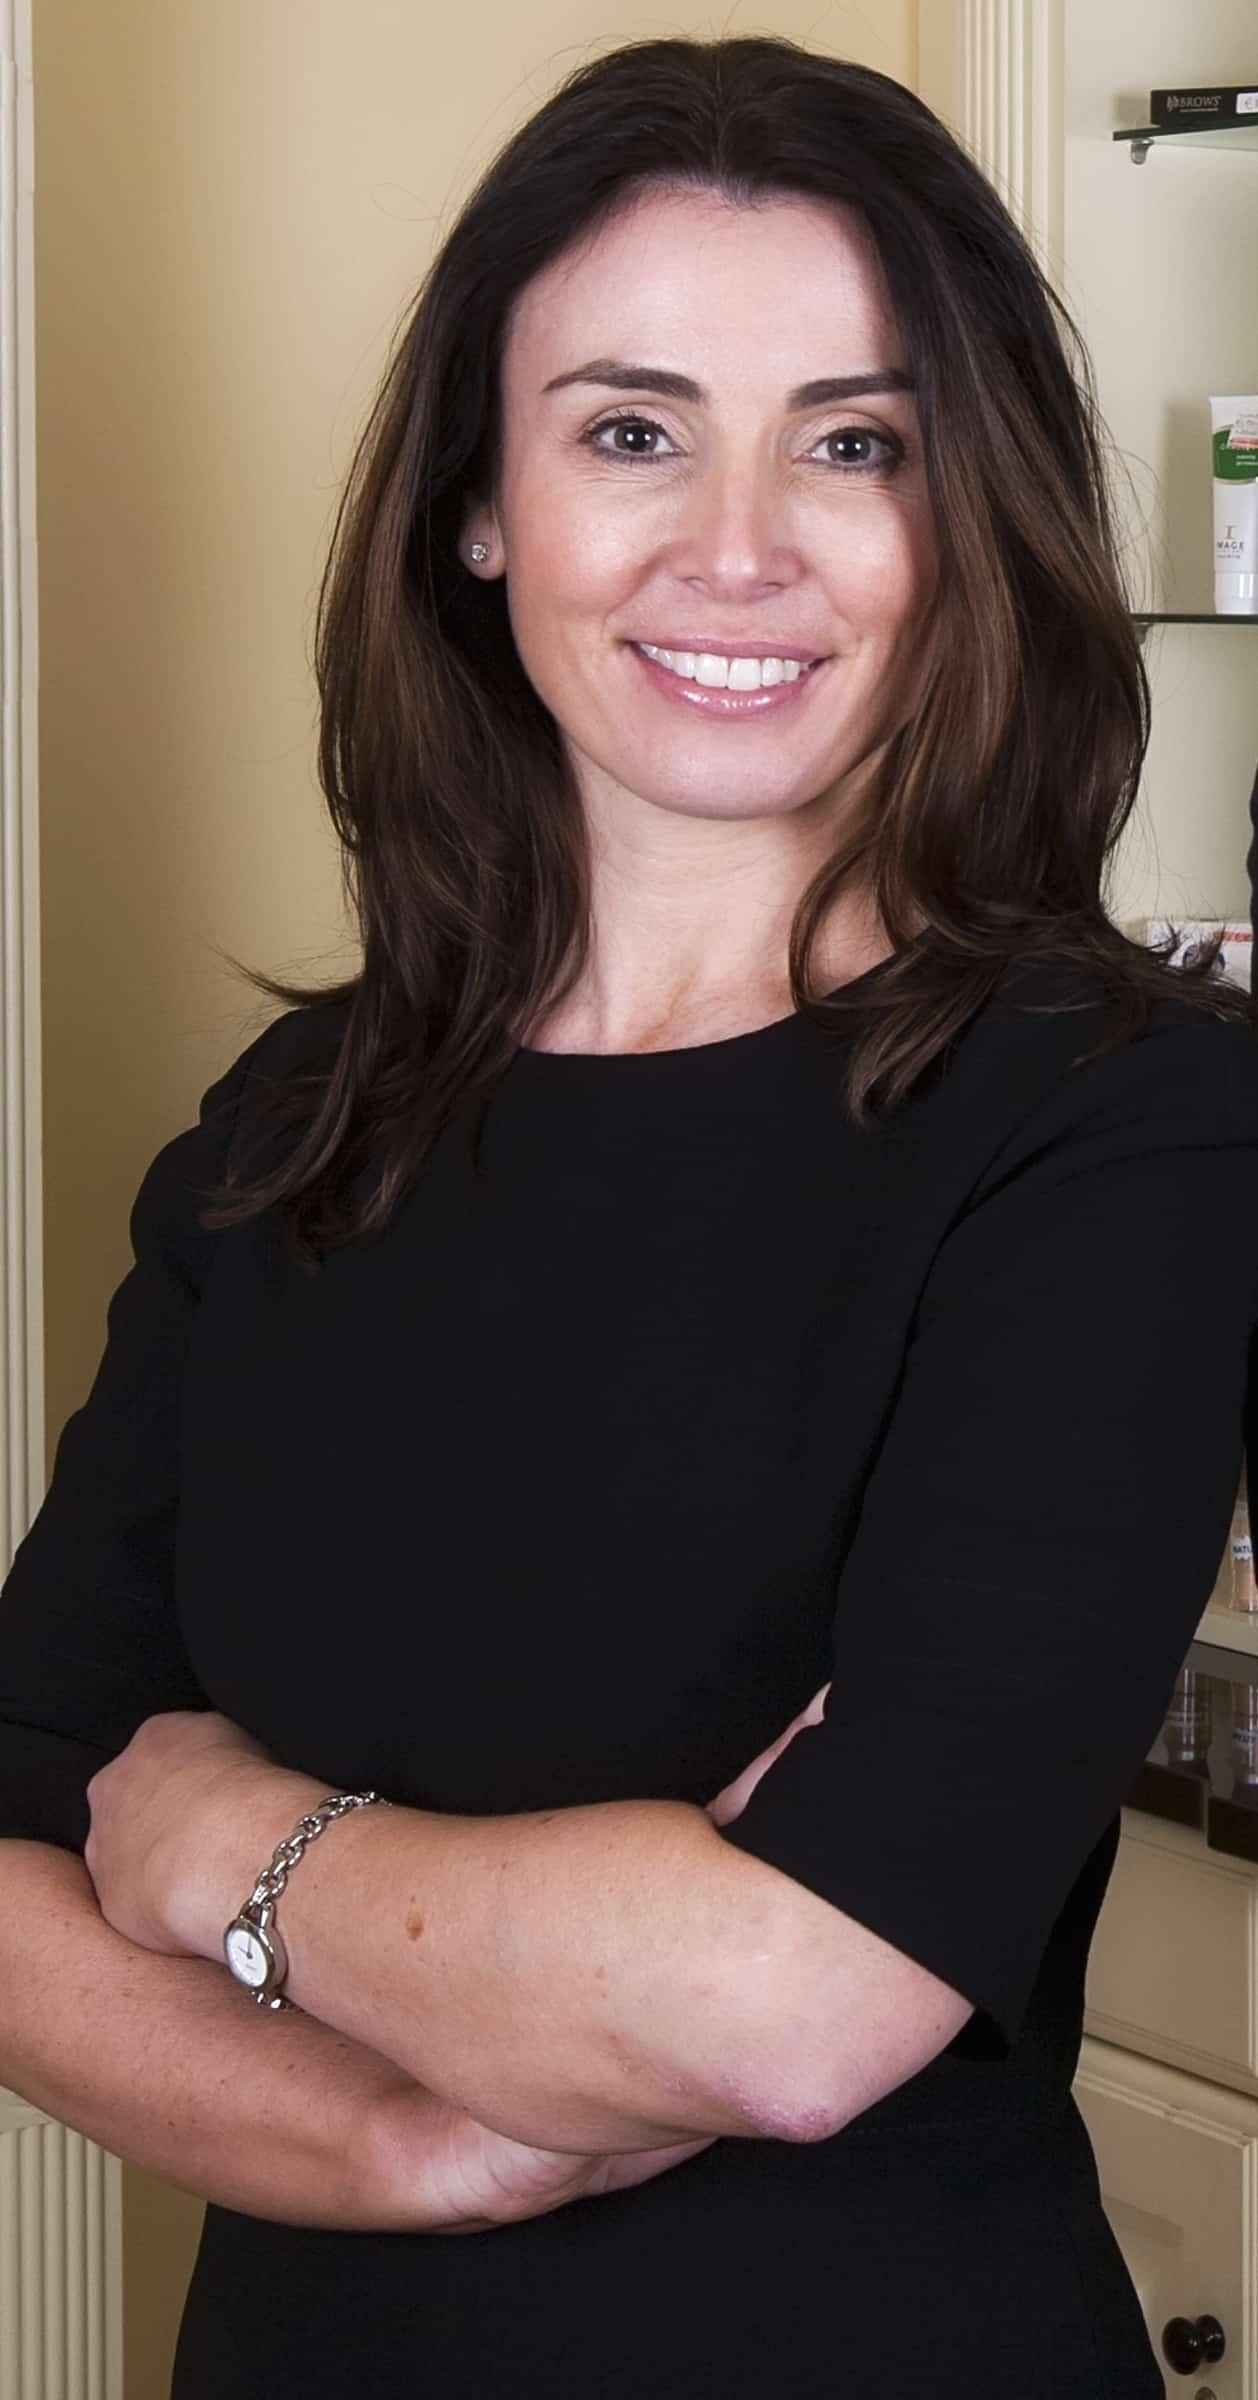 Sharon Gilmartin